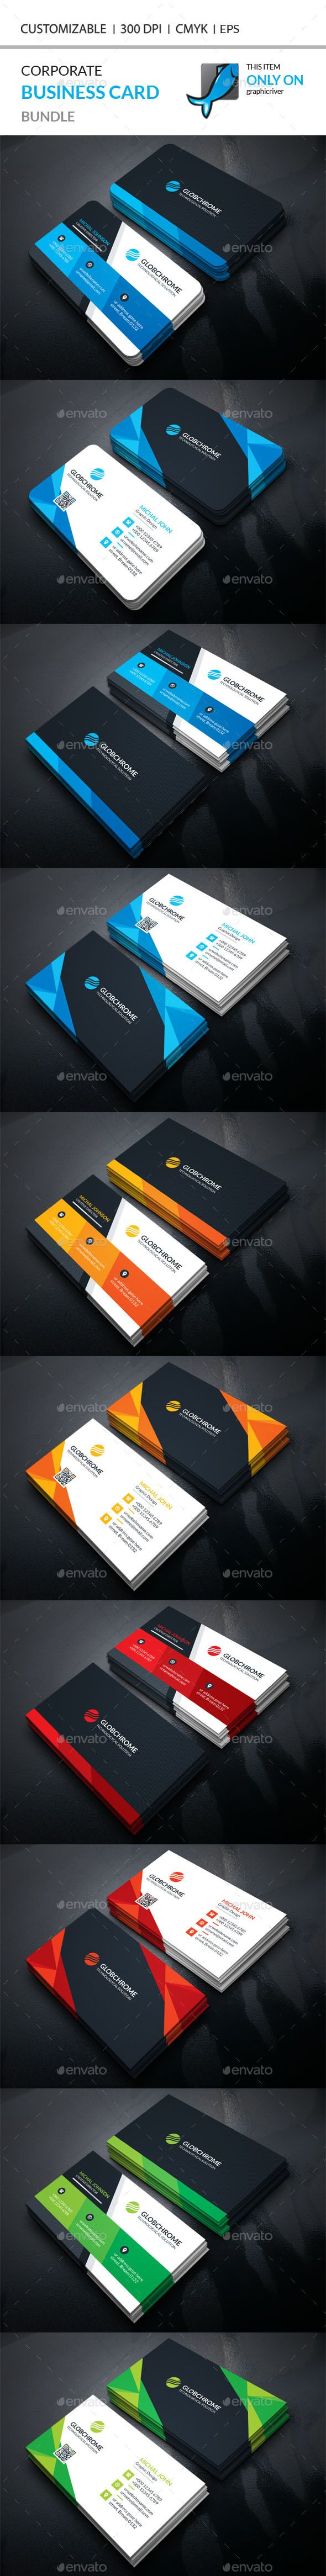 14 best modern business card designs images on pinterest